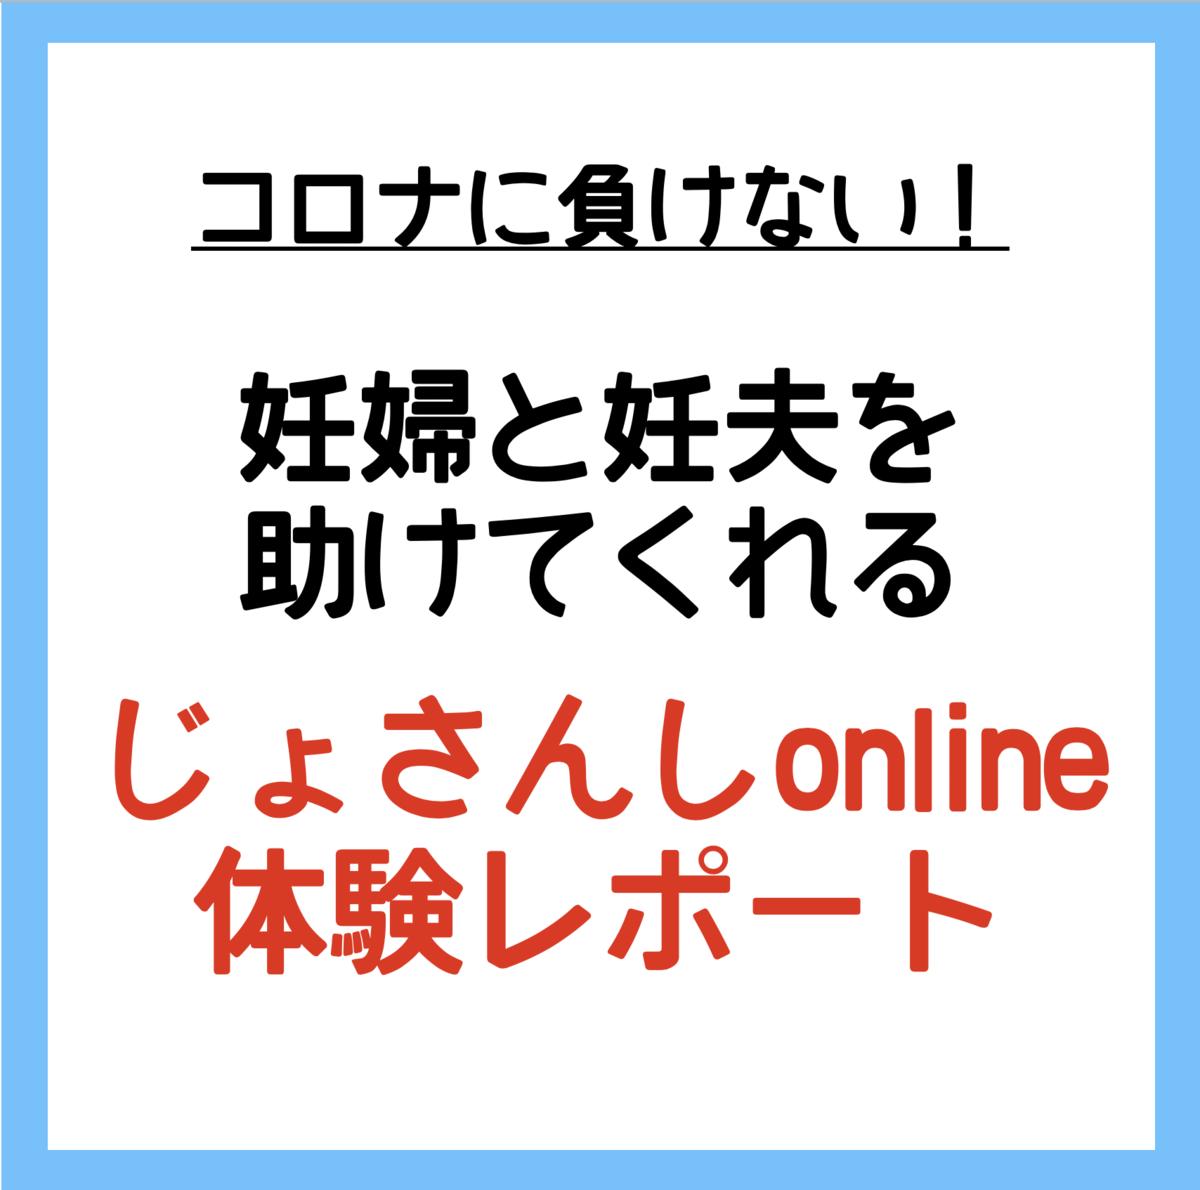 f:id:KenChan:20200511213236p:plain